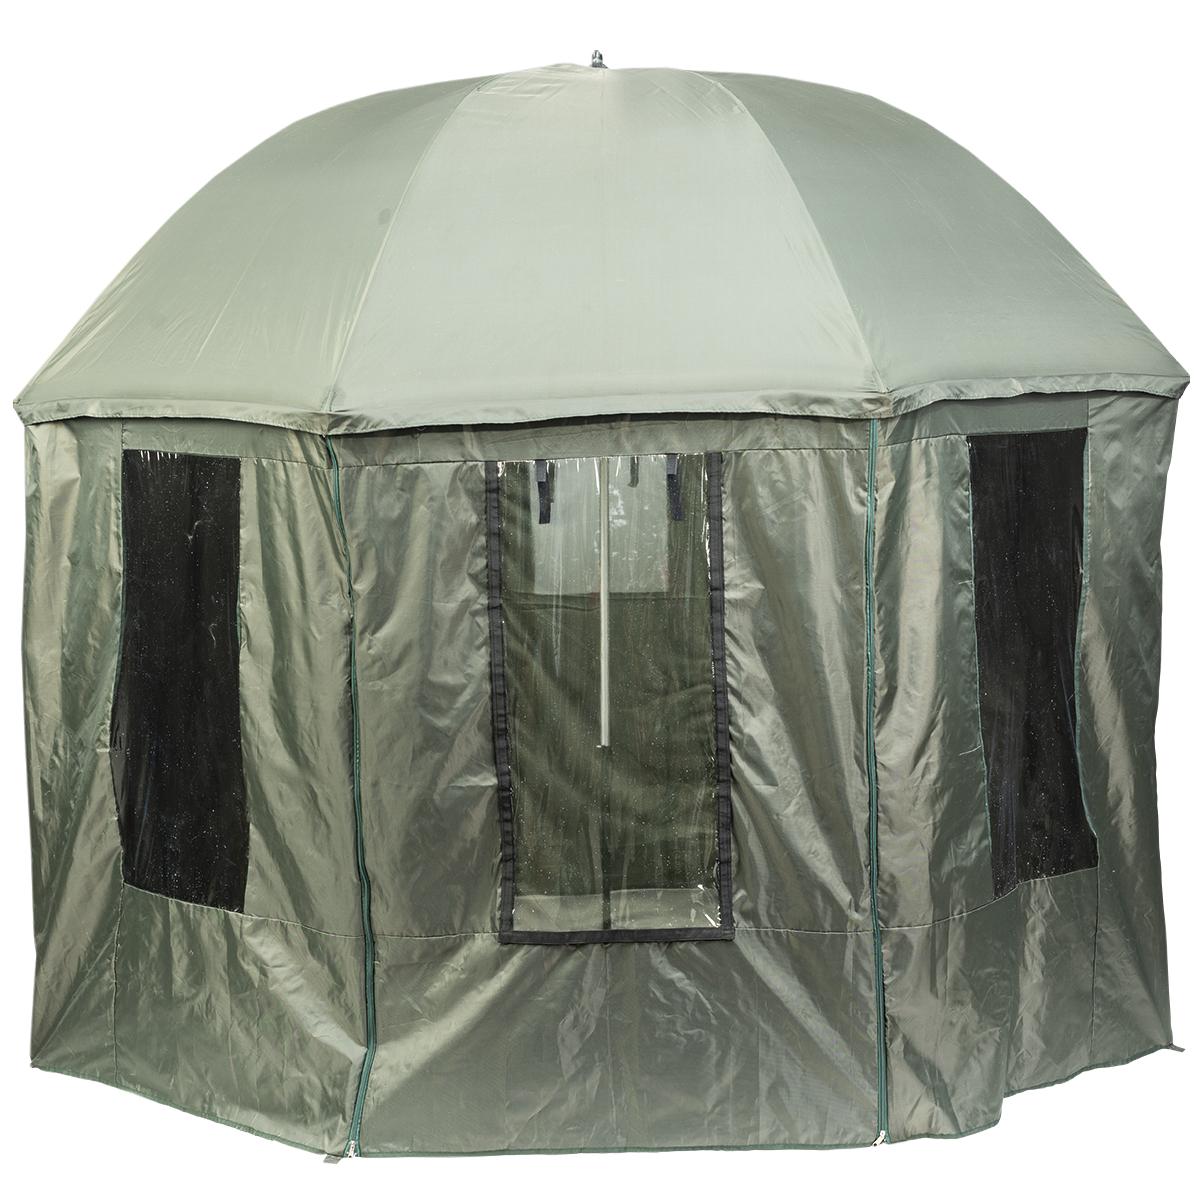 Jaxon - Celokrytý deštník 300cm